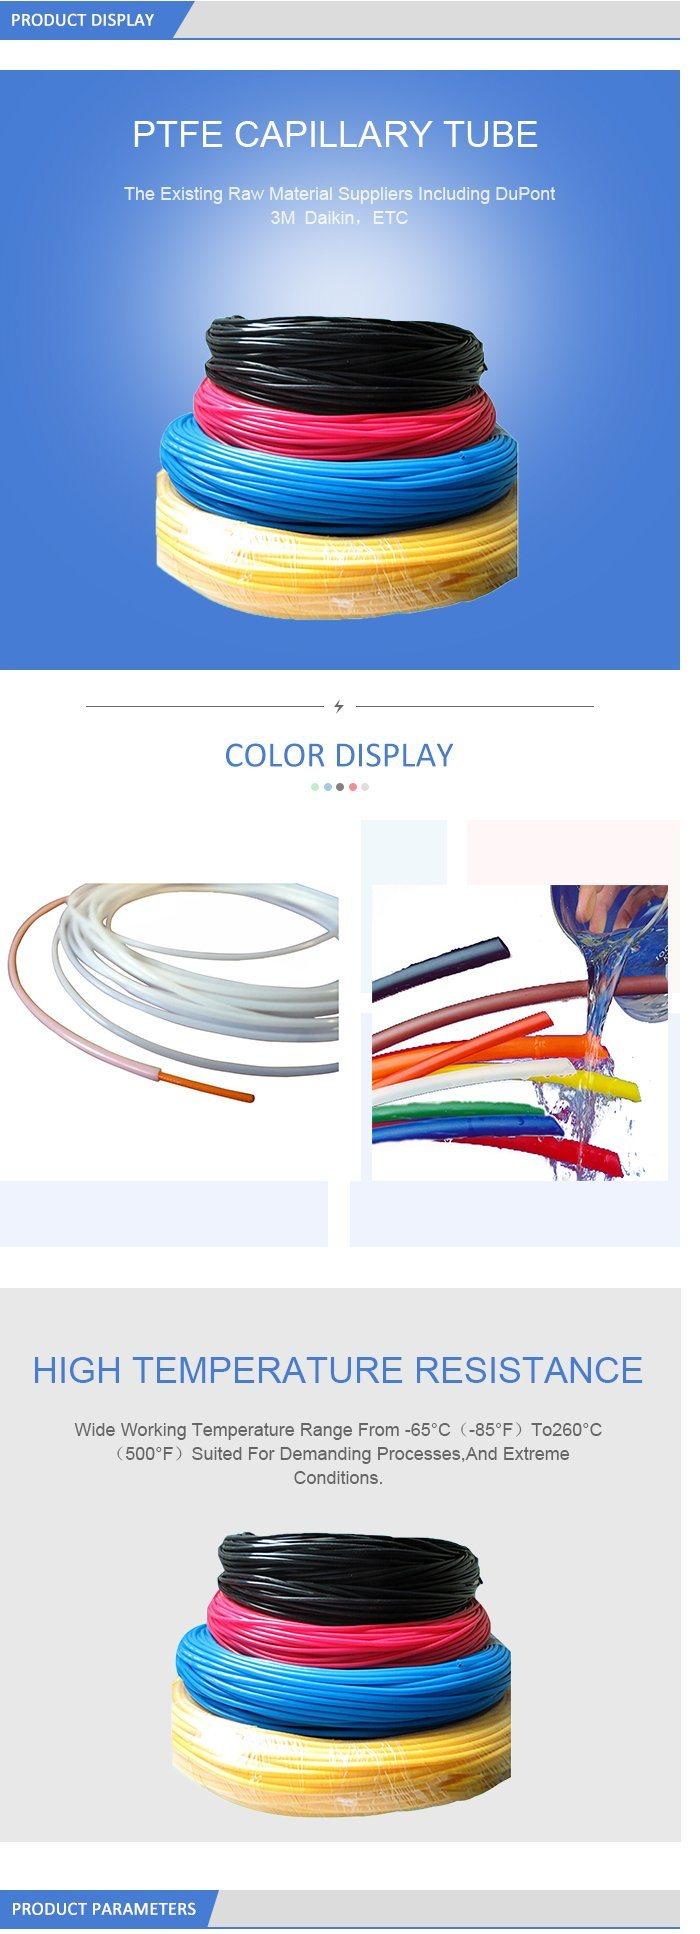 China High Quality Glass Capillary Tube Cheap Copper Capillary Tube